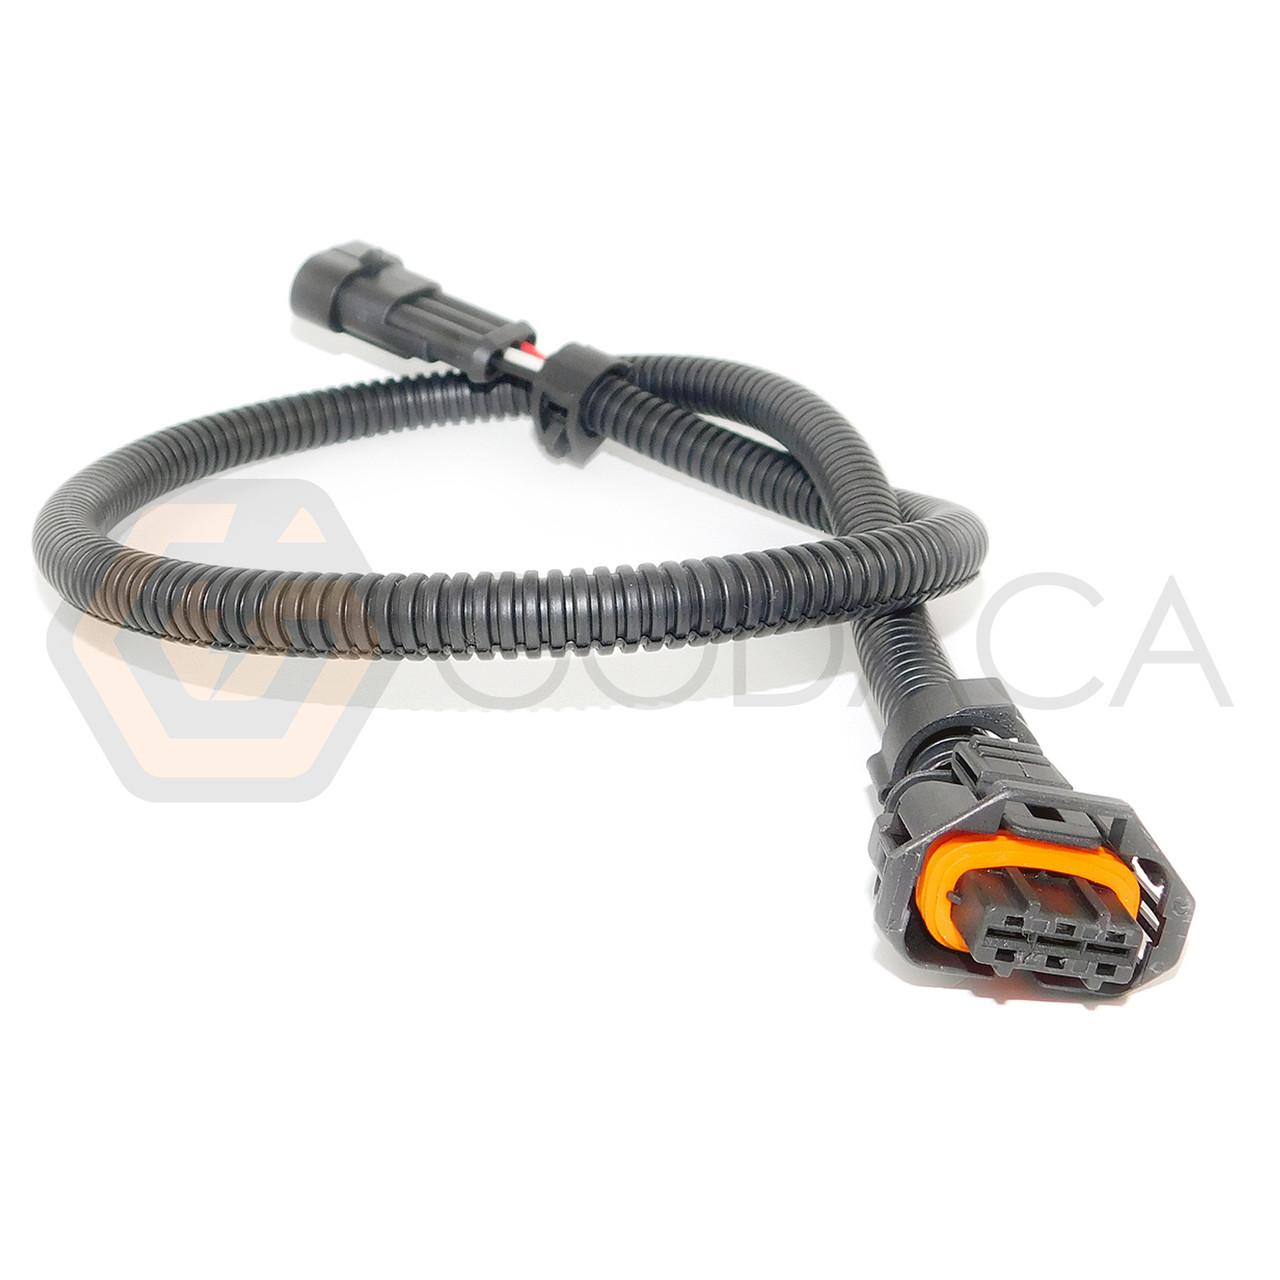 medium resolution of ls3 map sensor wiring wiring diagrams ford map sensor wiring diagram 1x wiring harness adapter for